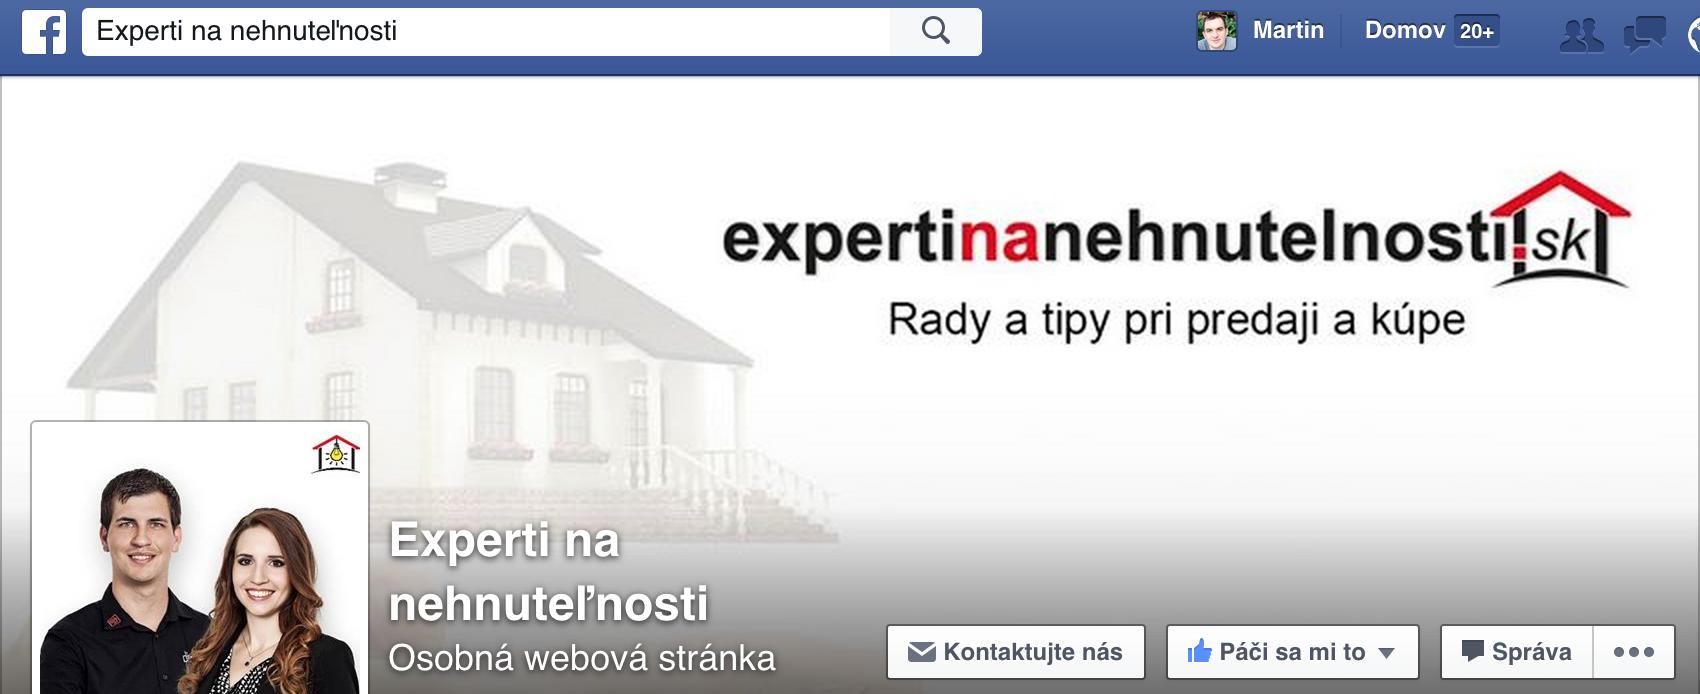 Rado Zarecký - Facebook fanpage